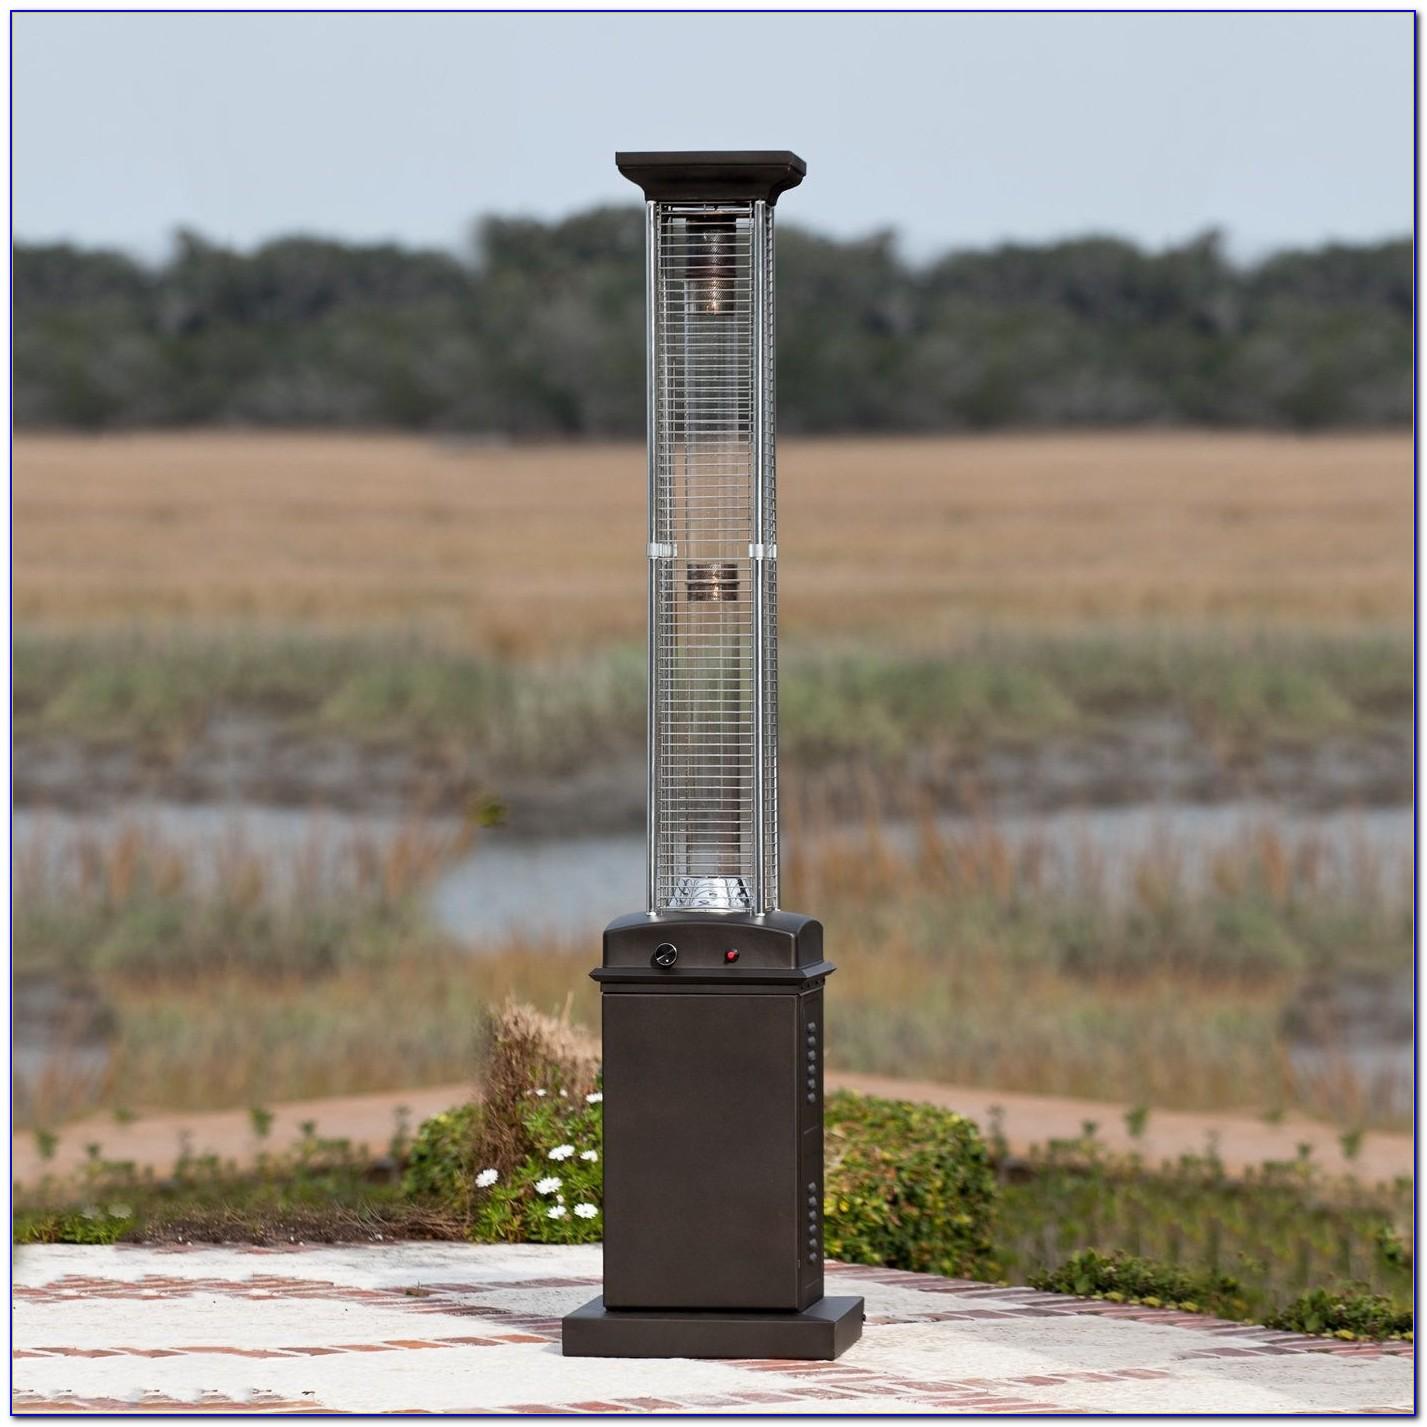 Fire Sense Patio Heater Will Not Stay Lit